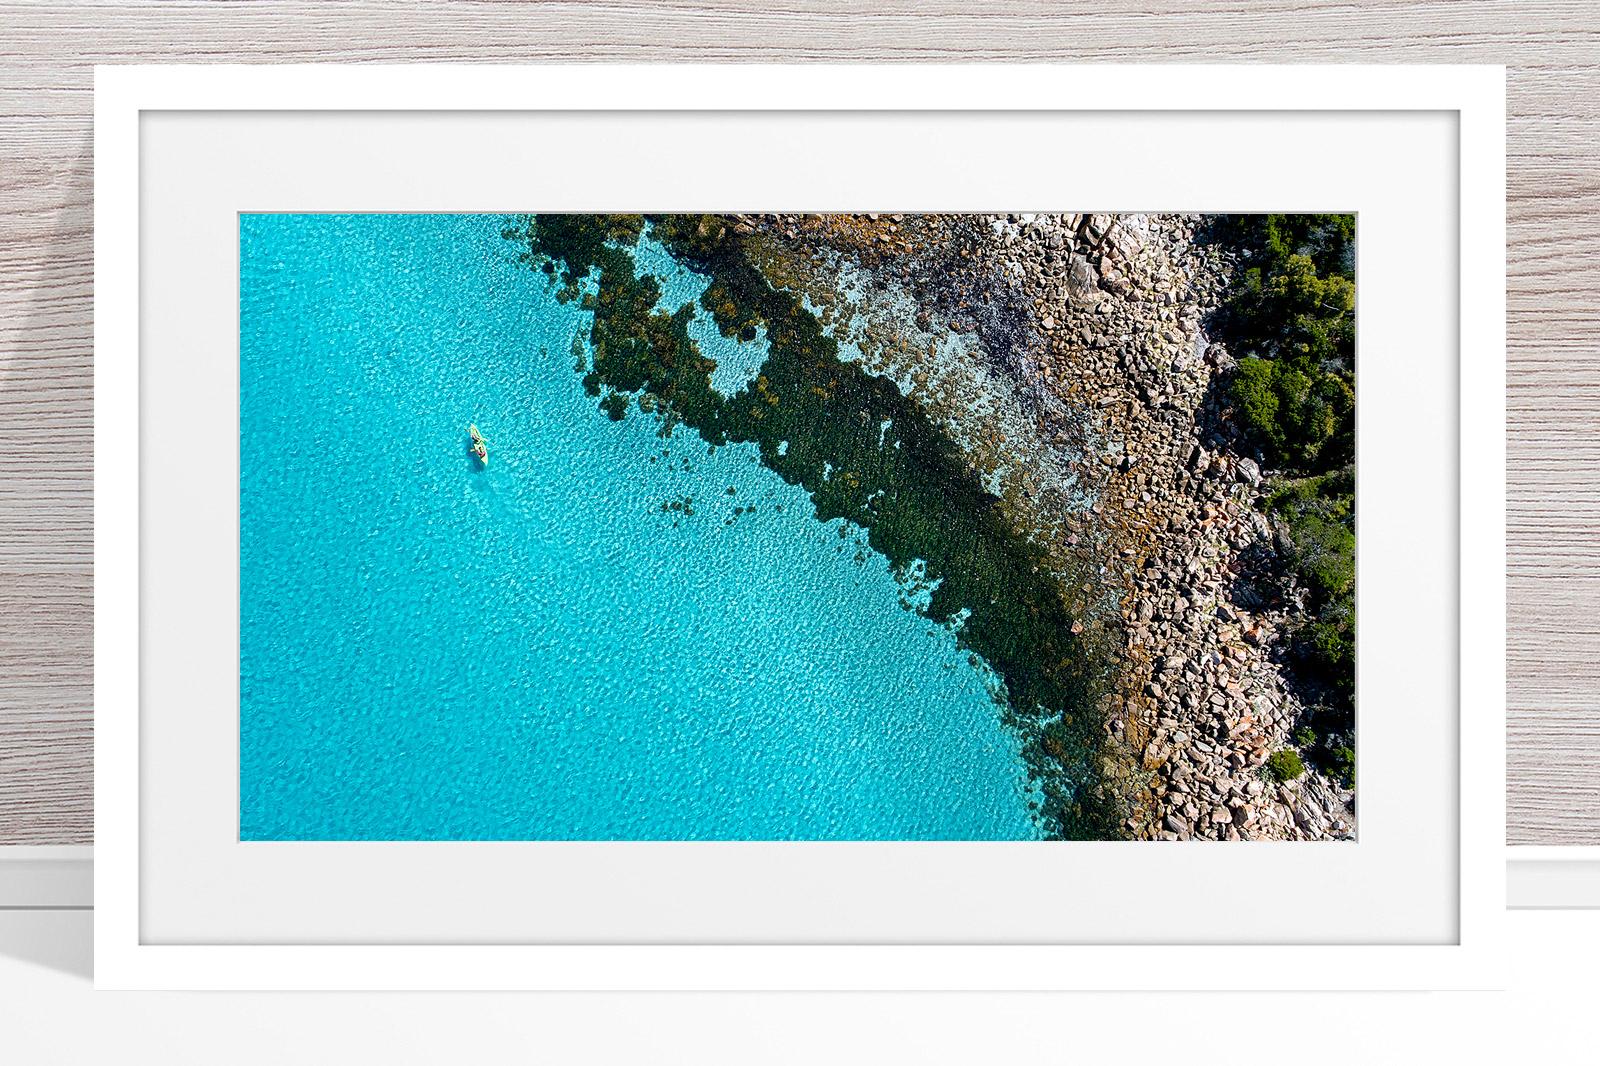 025 - Jason Mazur - 'Kayaker, Geographe Bay, Dunsborough' White Frame